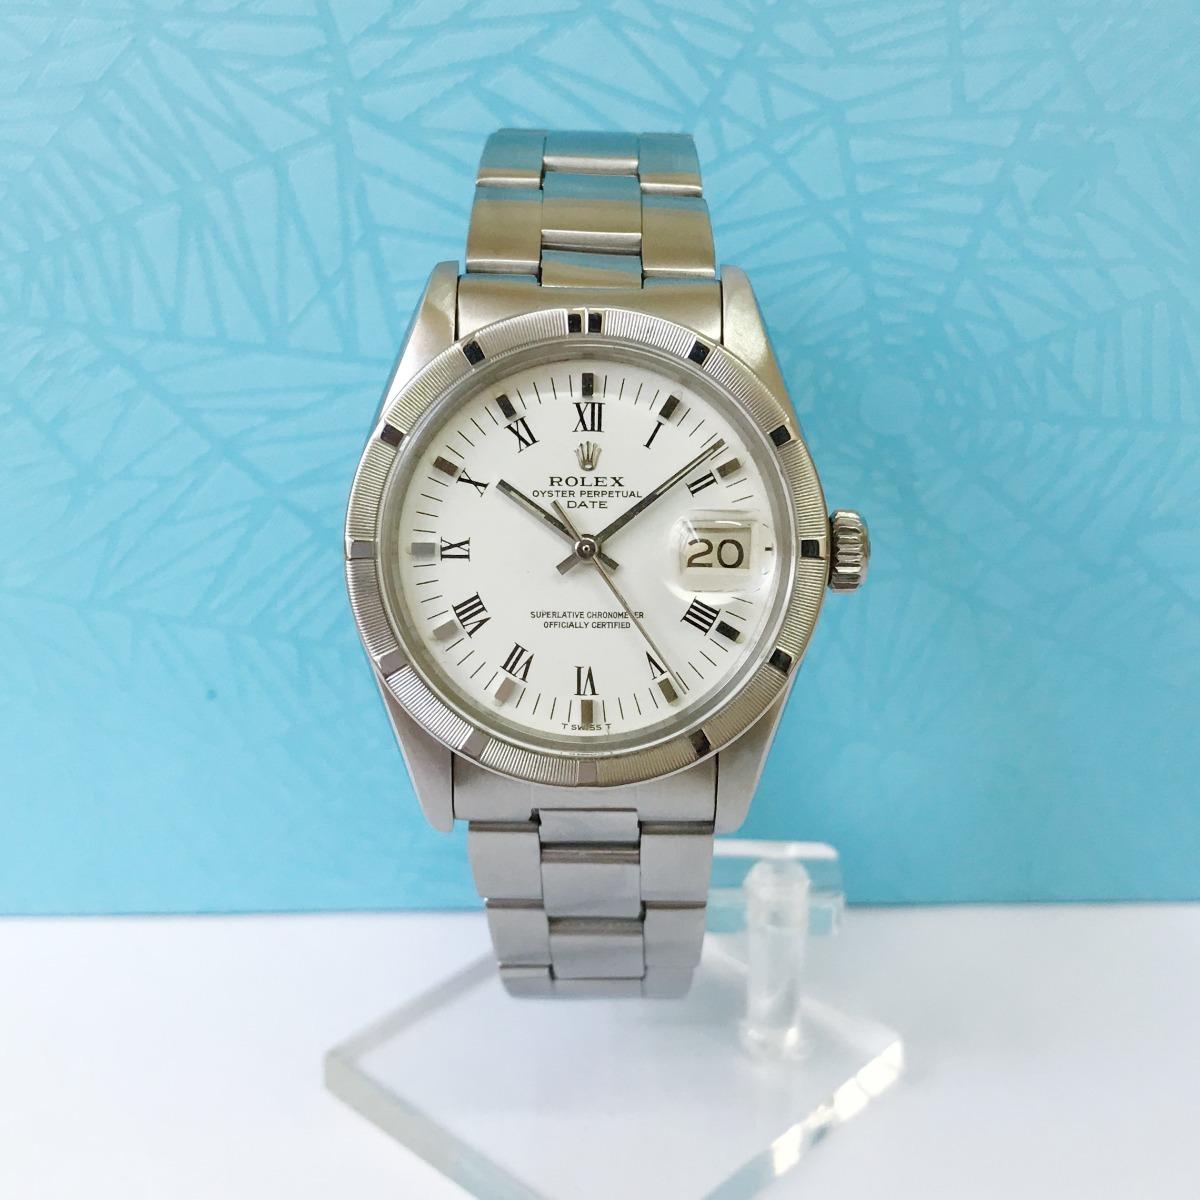 7a0fc0c3e8cd Reloj De Hombre Rolex 1501 Oyster Perpetual Date - $ 95.000,00